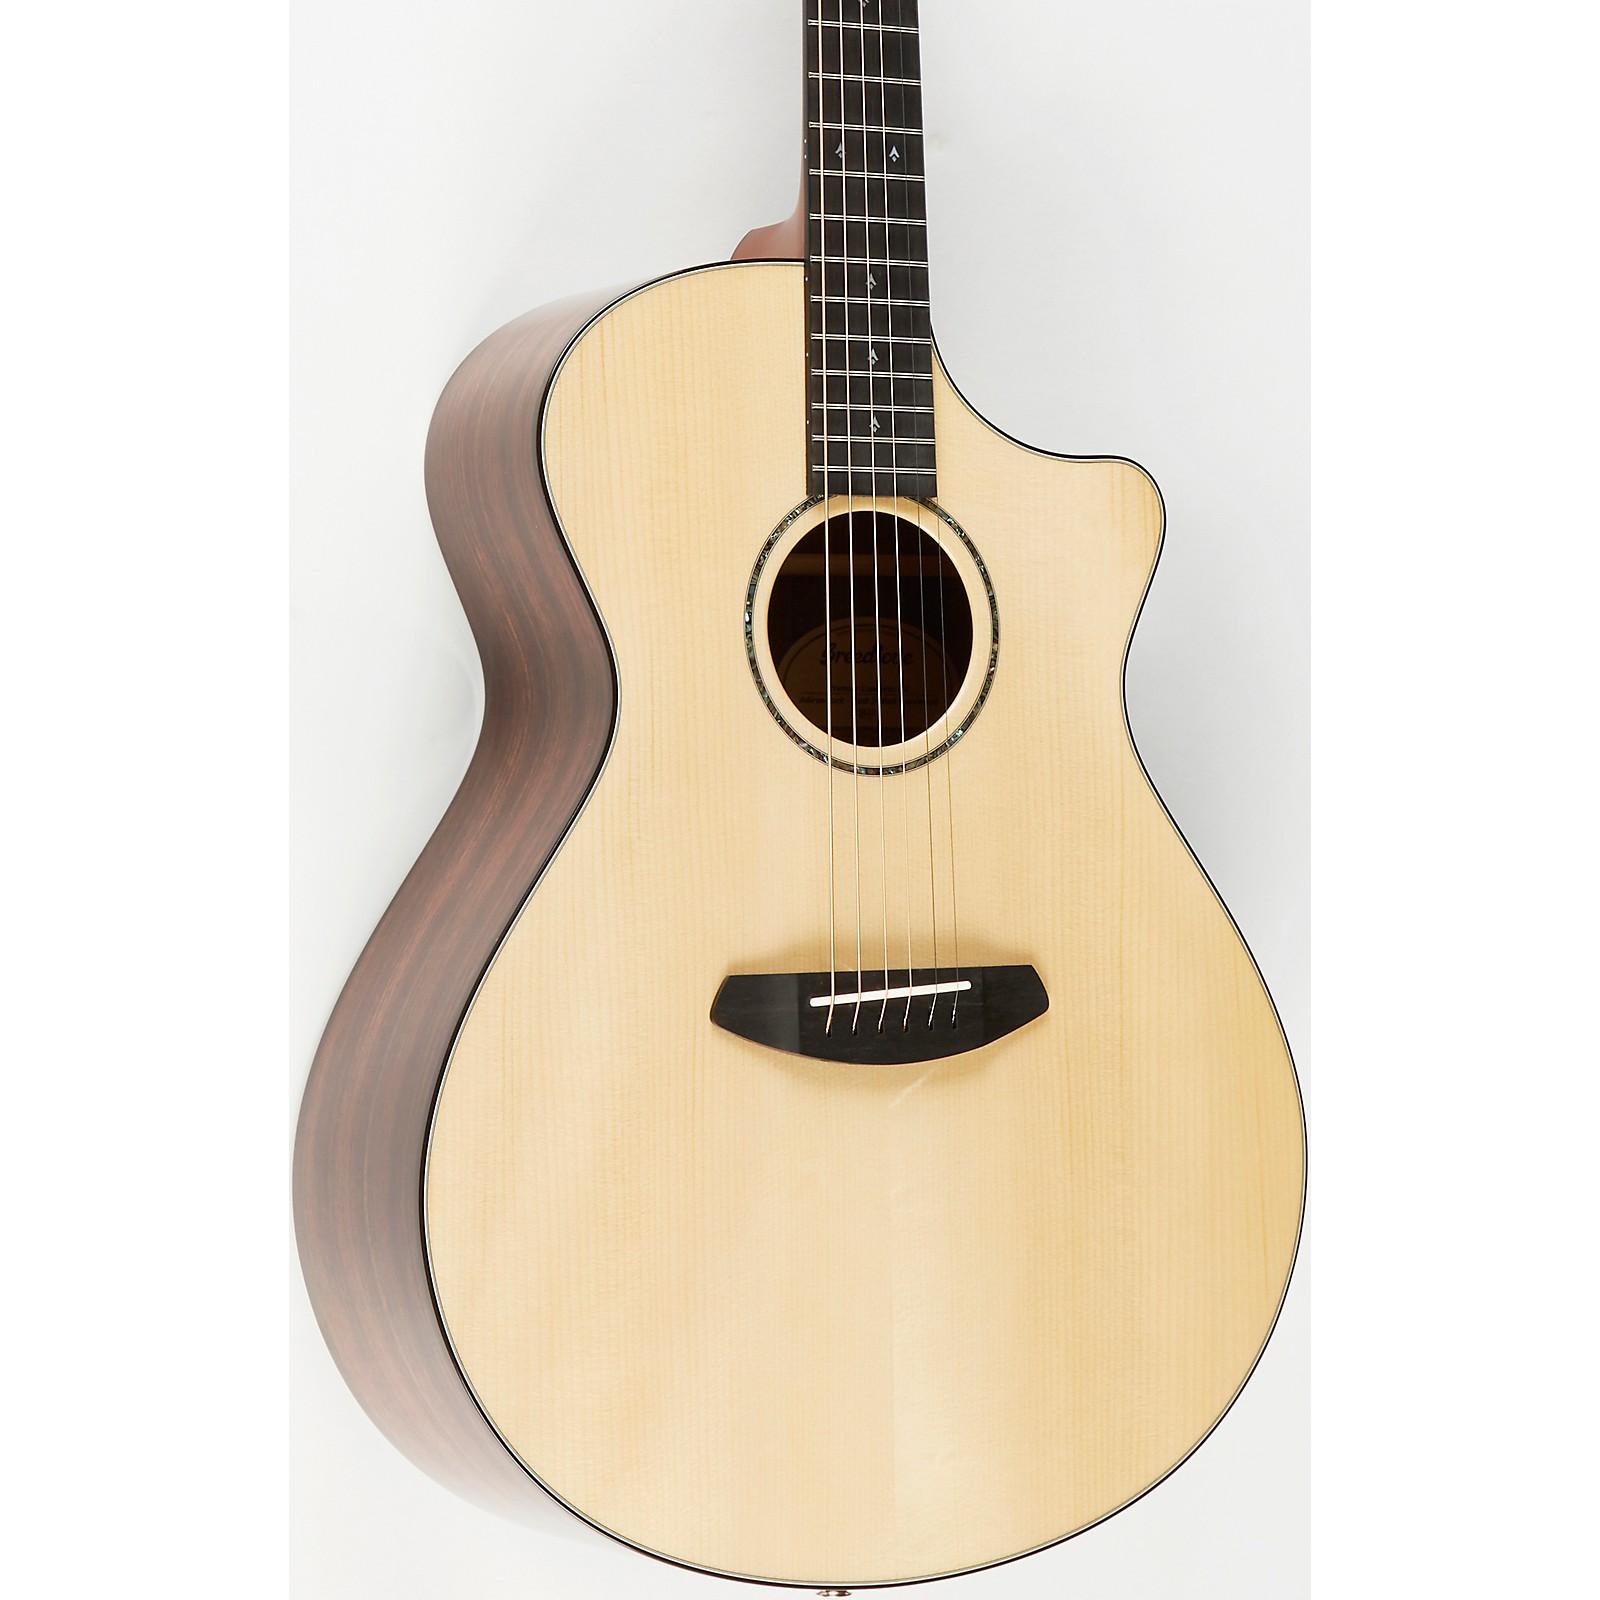 Breedlove Premier Concerto CE Adirondack-East Indian Rosewood Acoustic-Electric Guitar